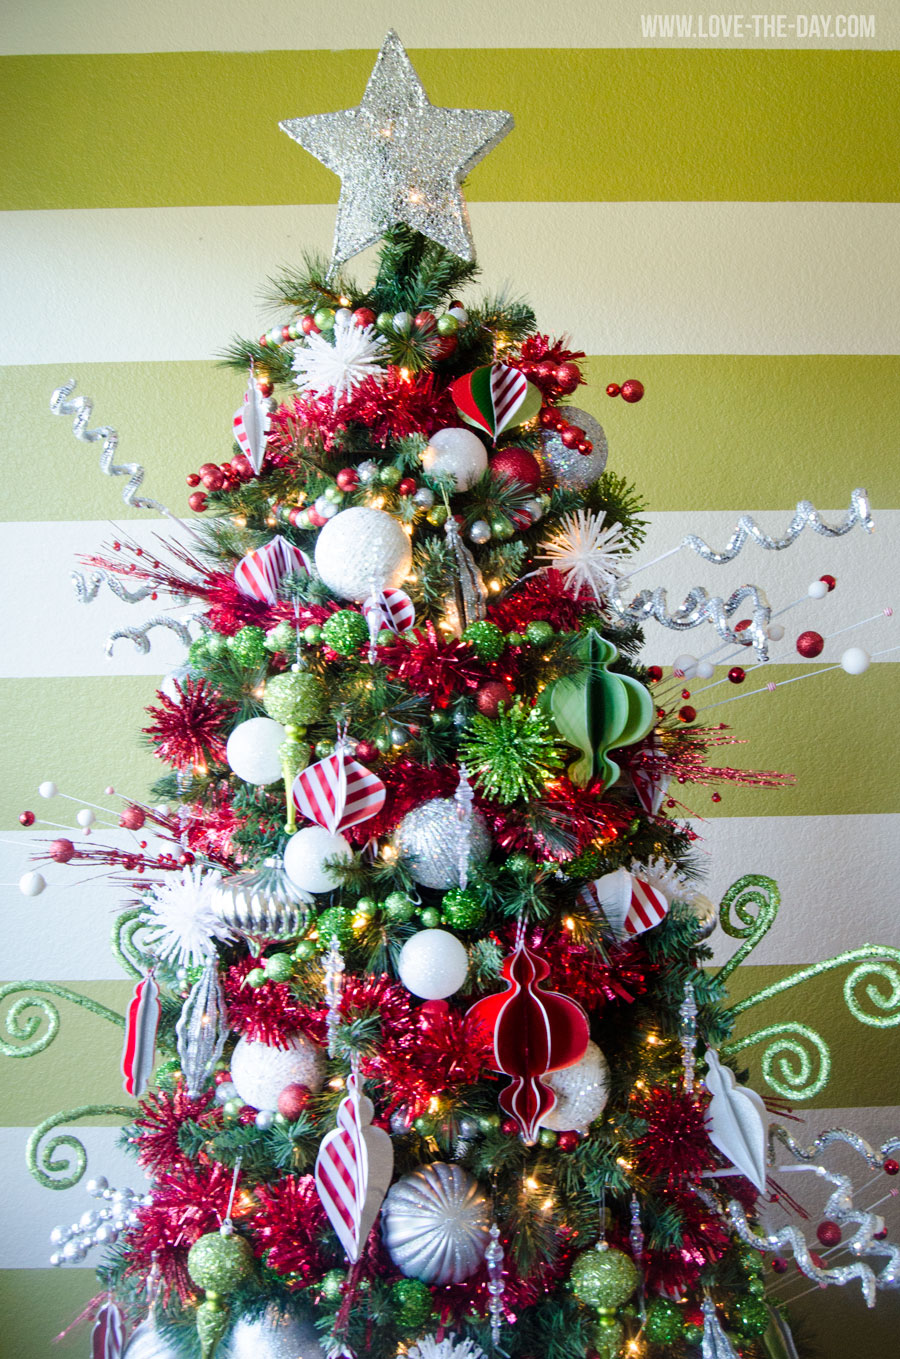 Whimsical Christmas Tree Decorating Idea